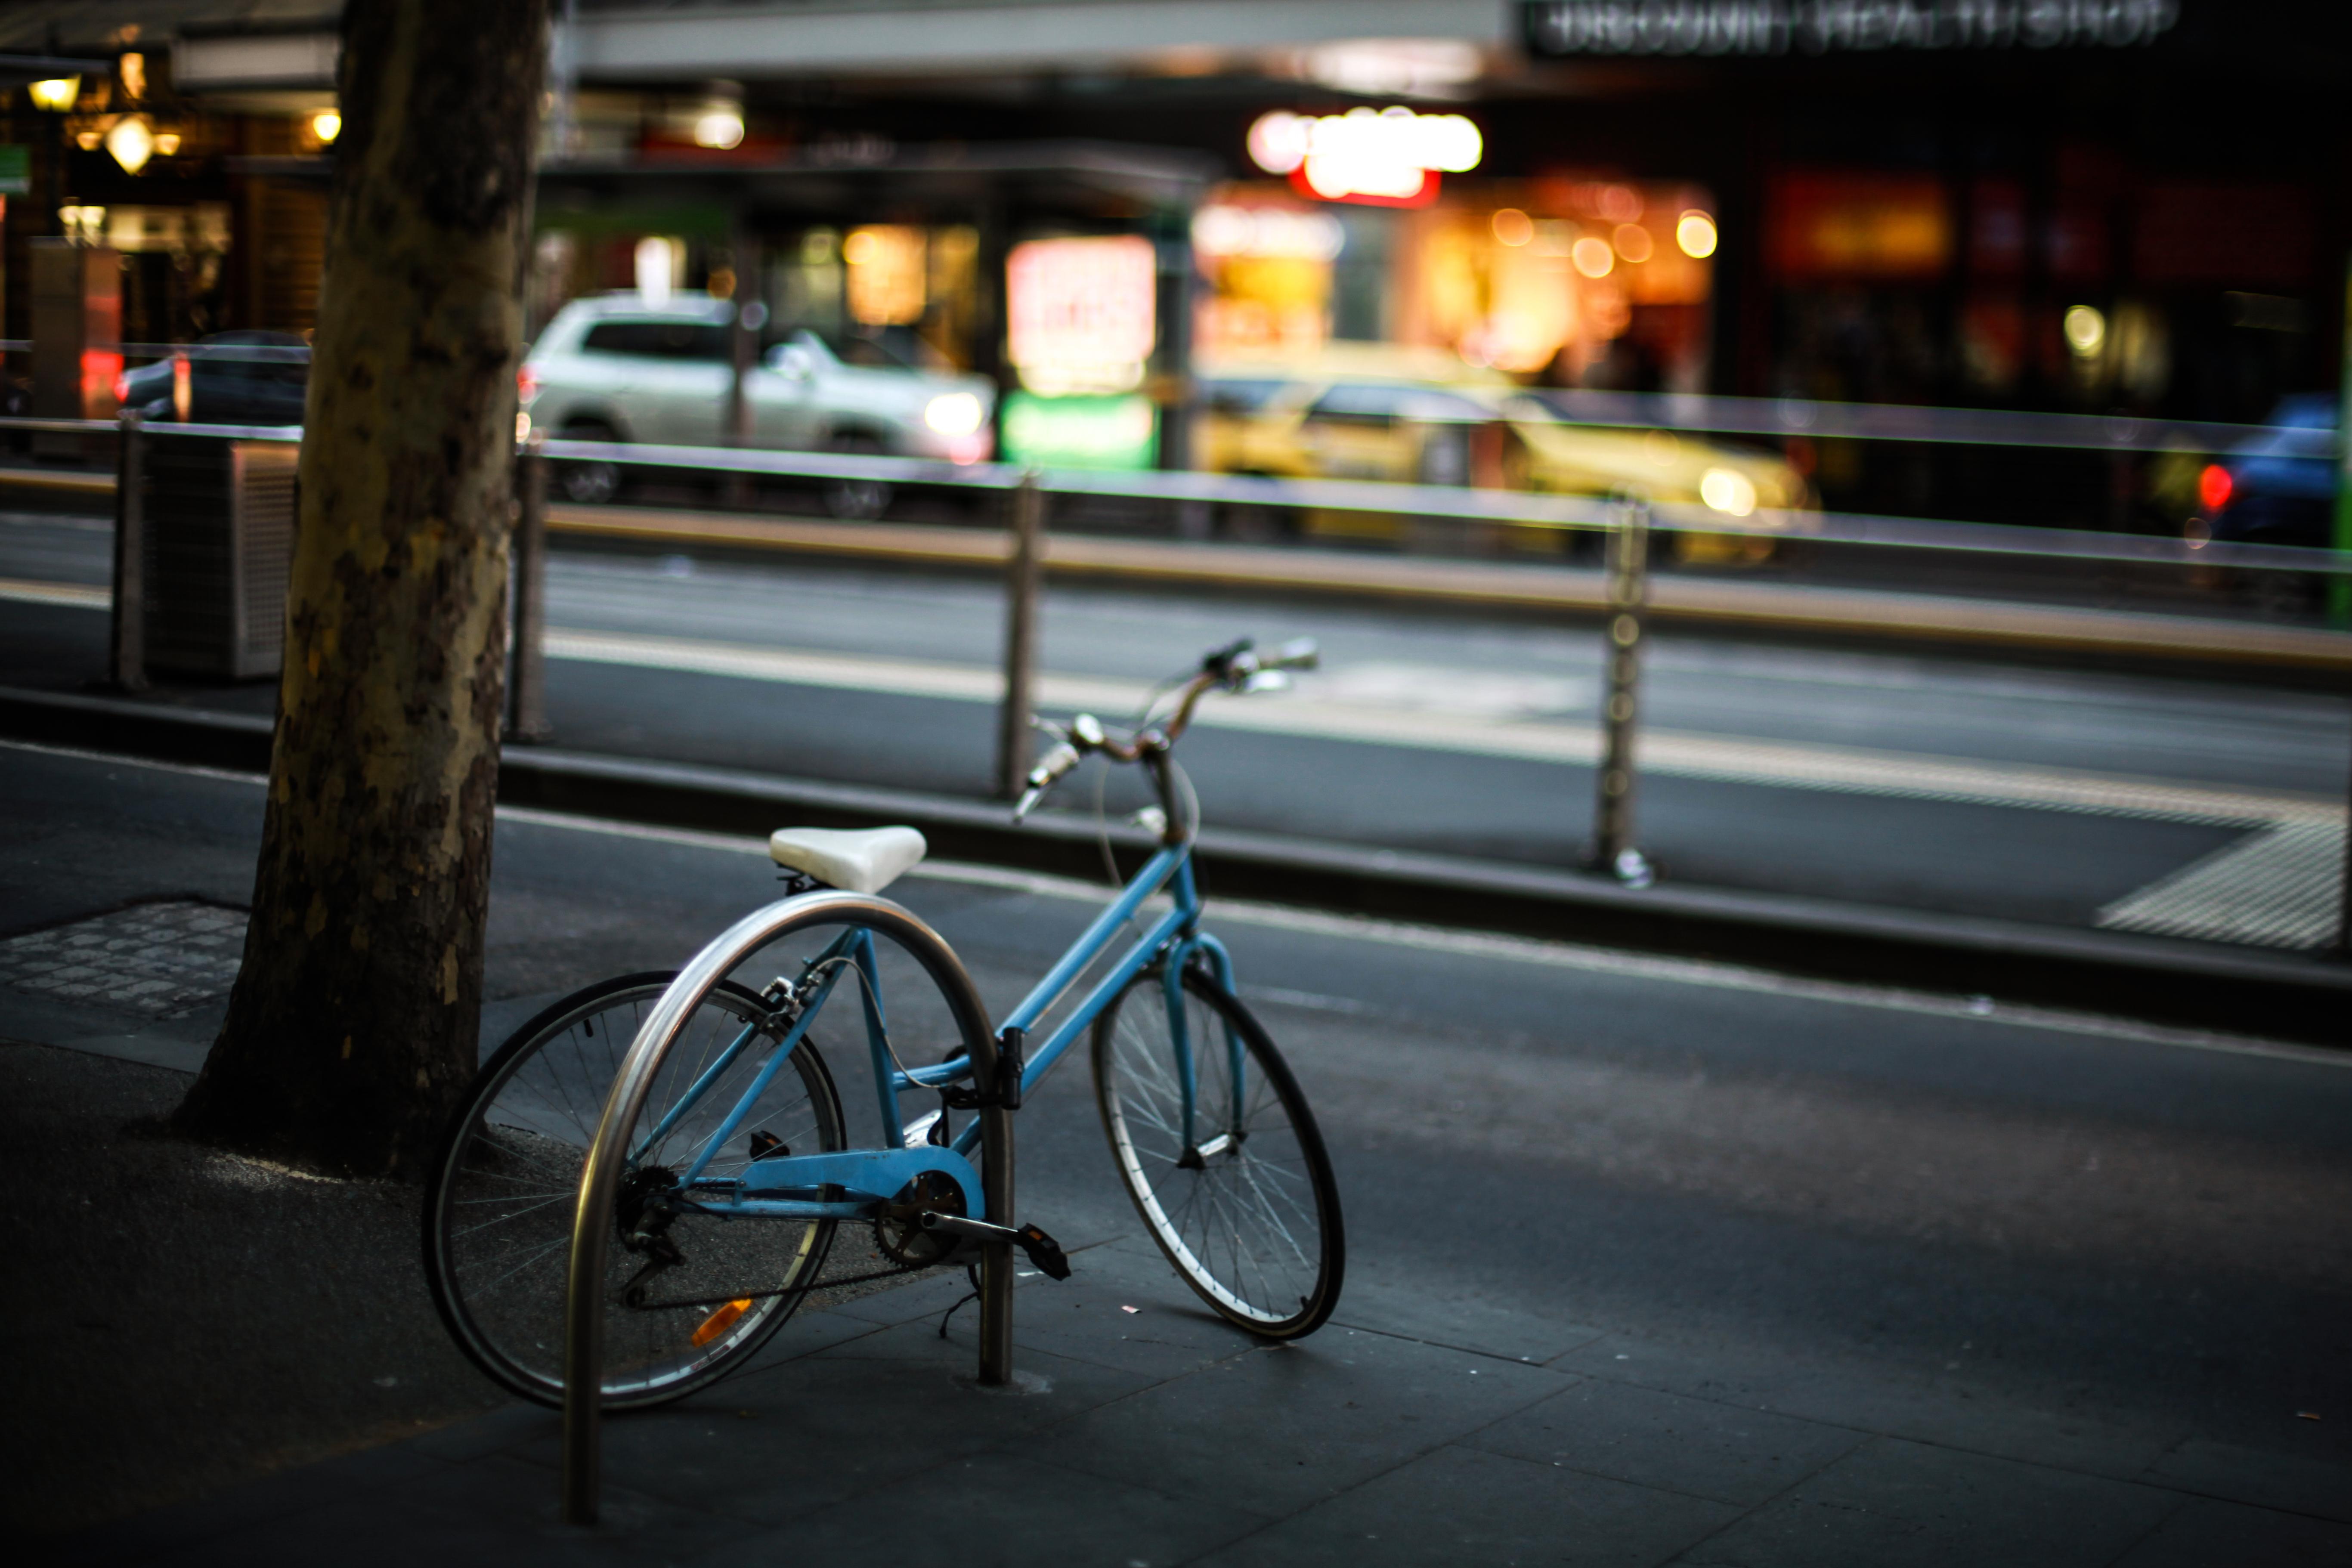 Hintergrundbilder : Stadt, Straße, Nacht-, Auto, Fahrrad, Fahrzeug ...